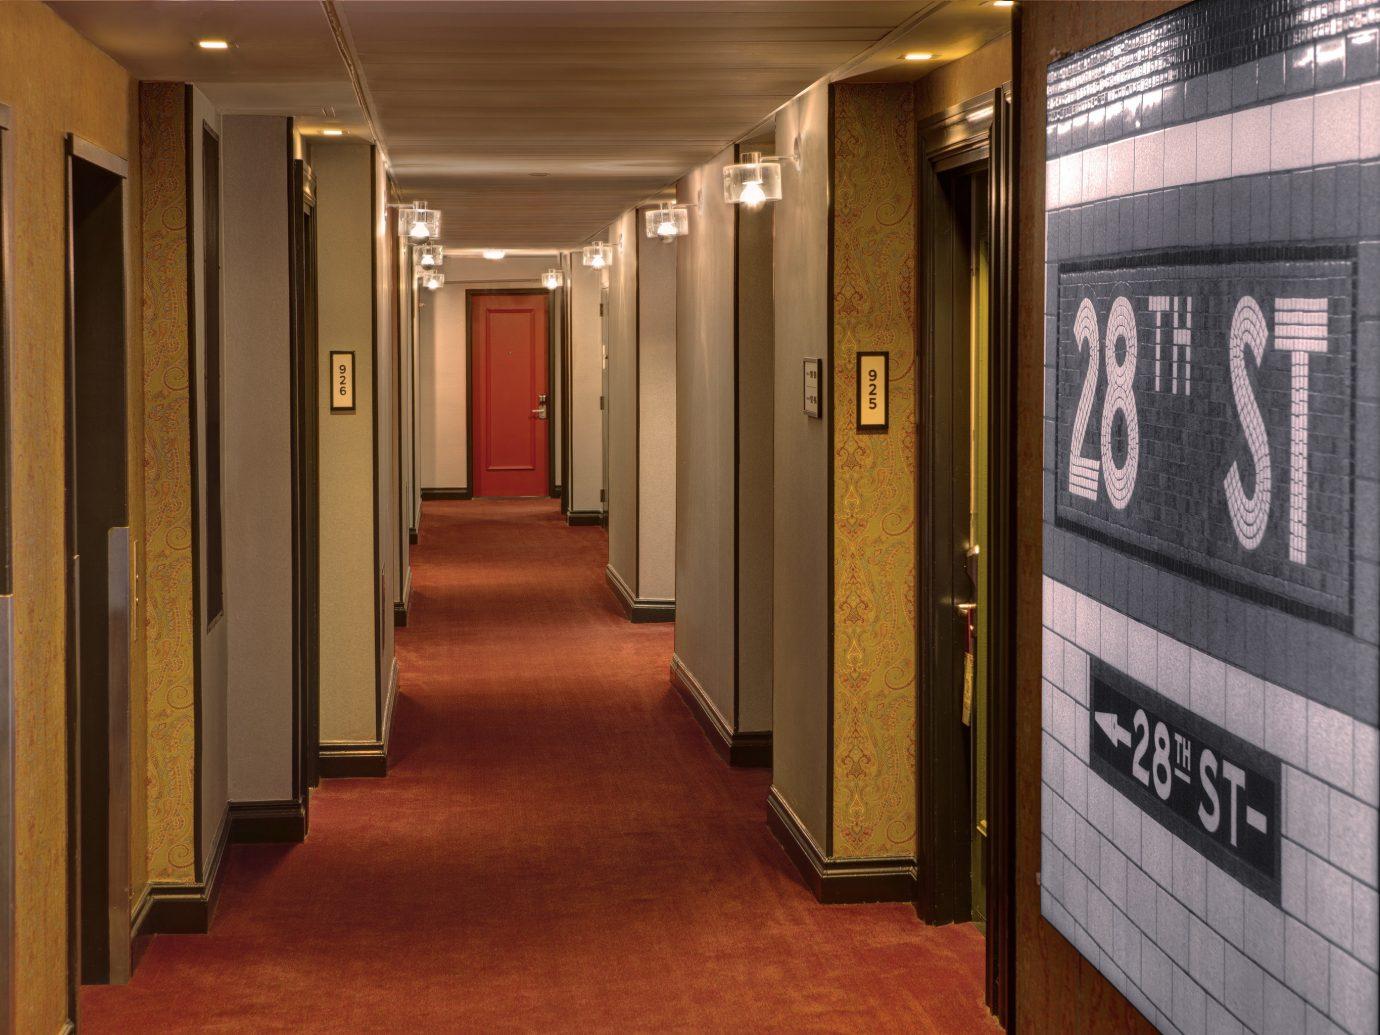 Hotels indoor floor ceiling room interior design hall public transport cabinet subway